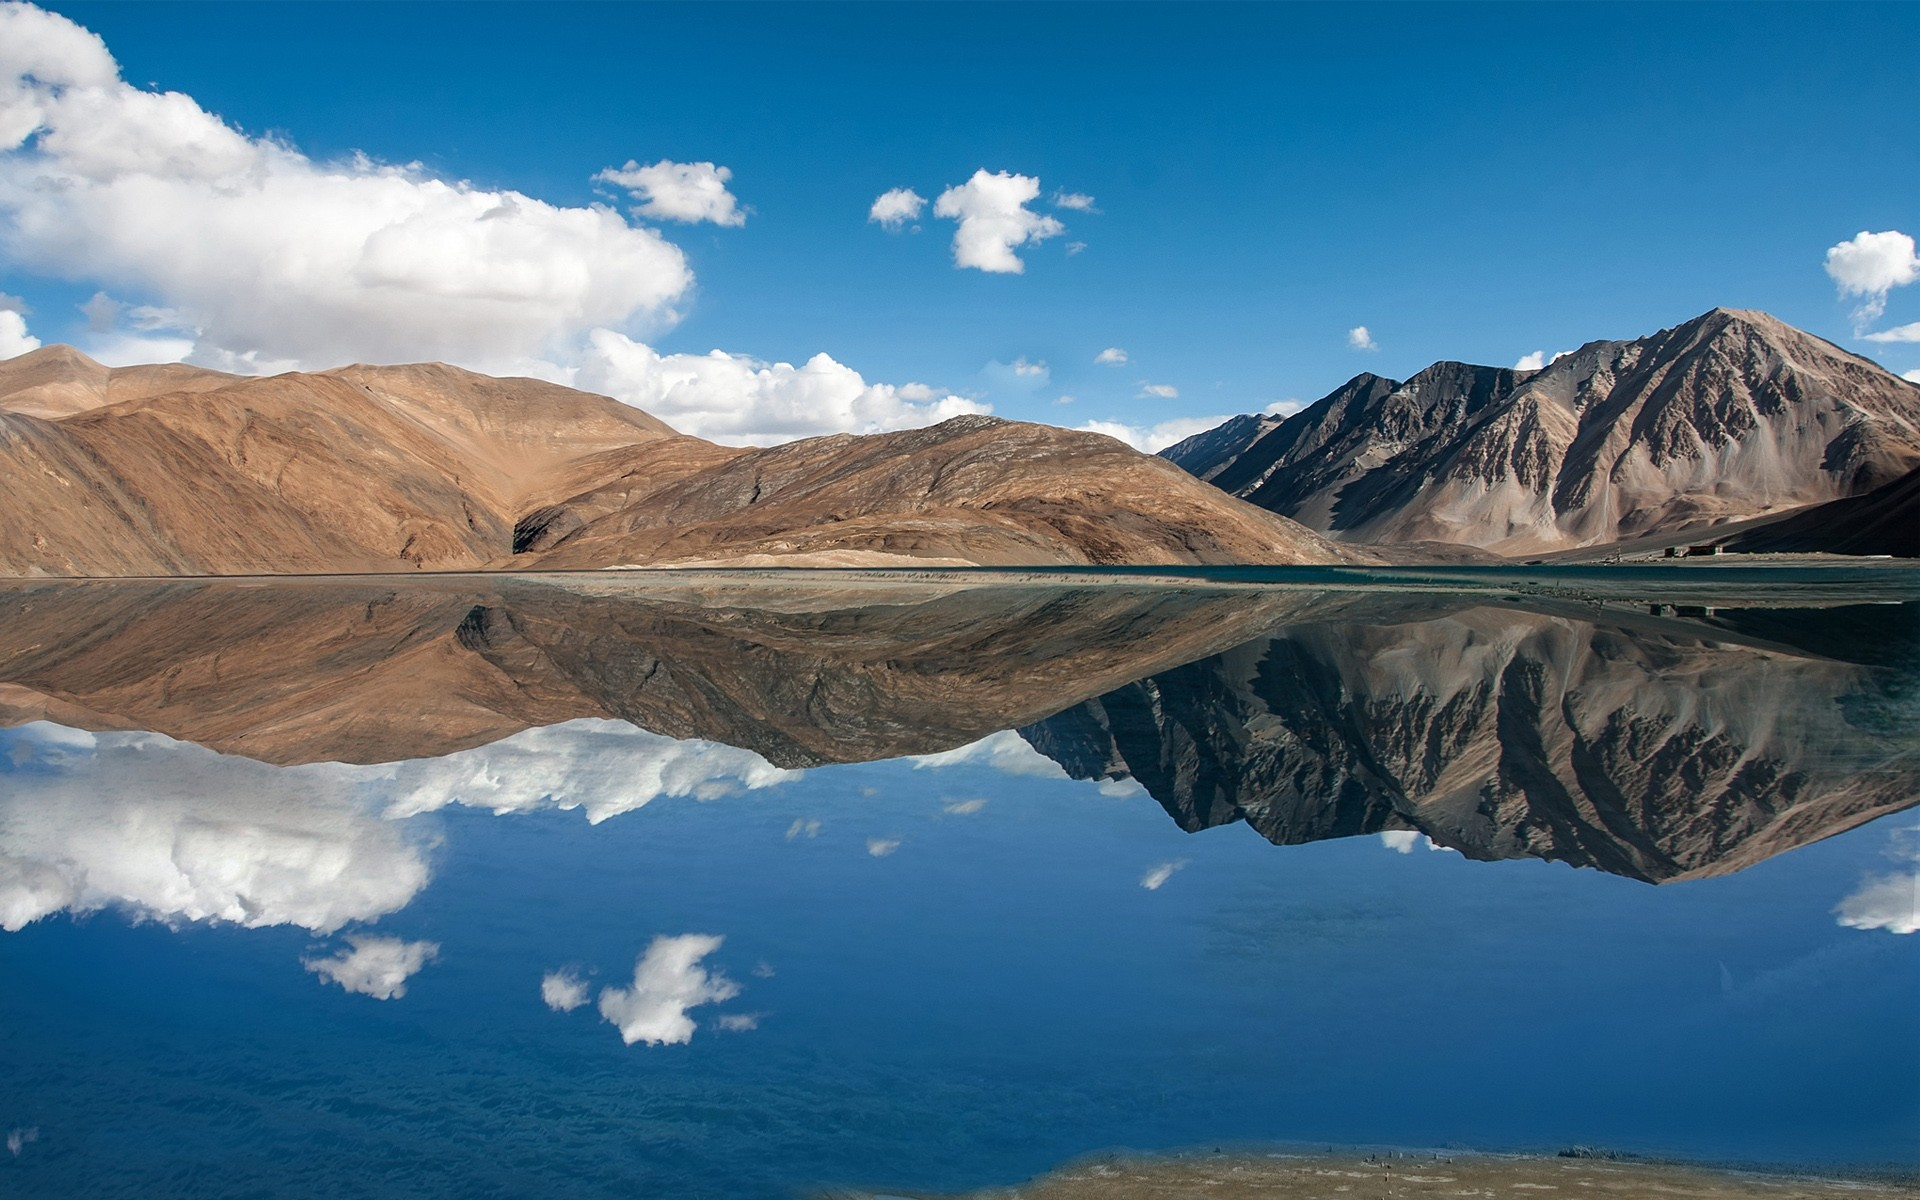 Hd wallpaper kashmir - Jammu Kashmir Pangong Lake